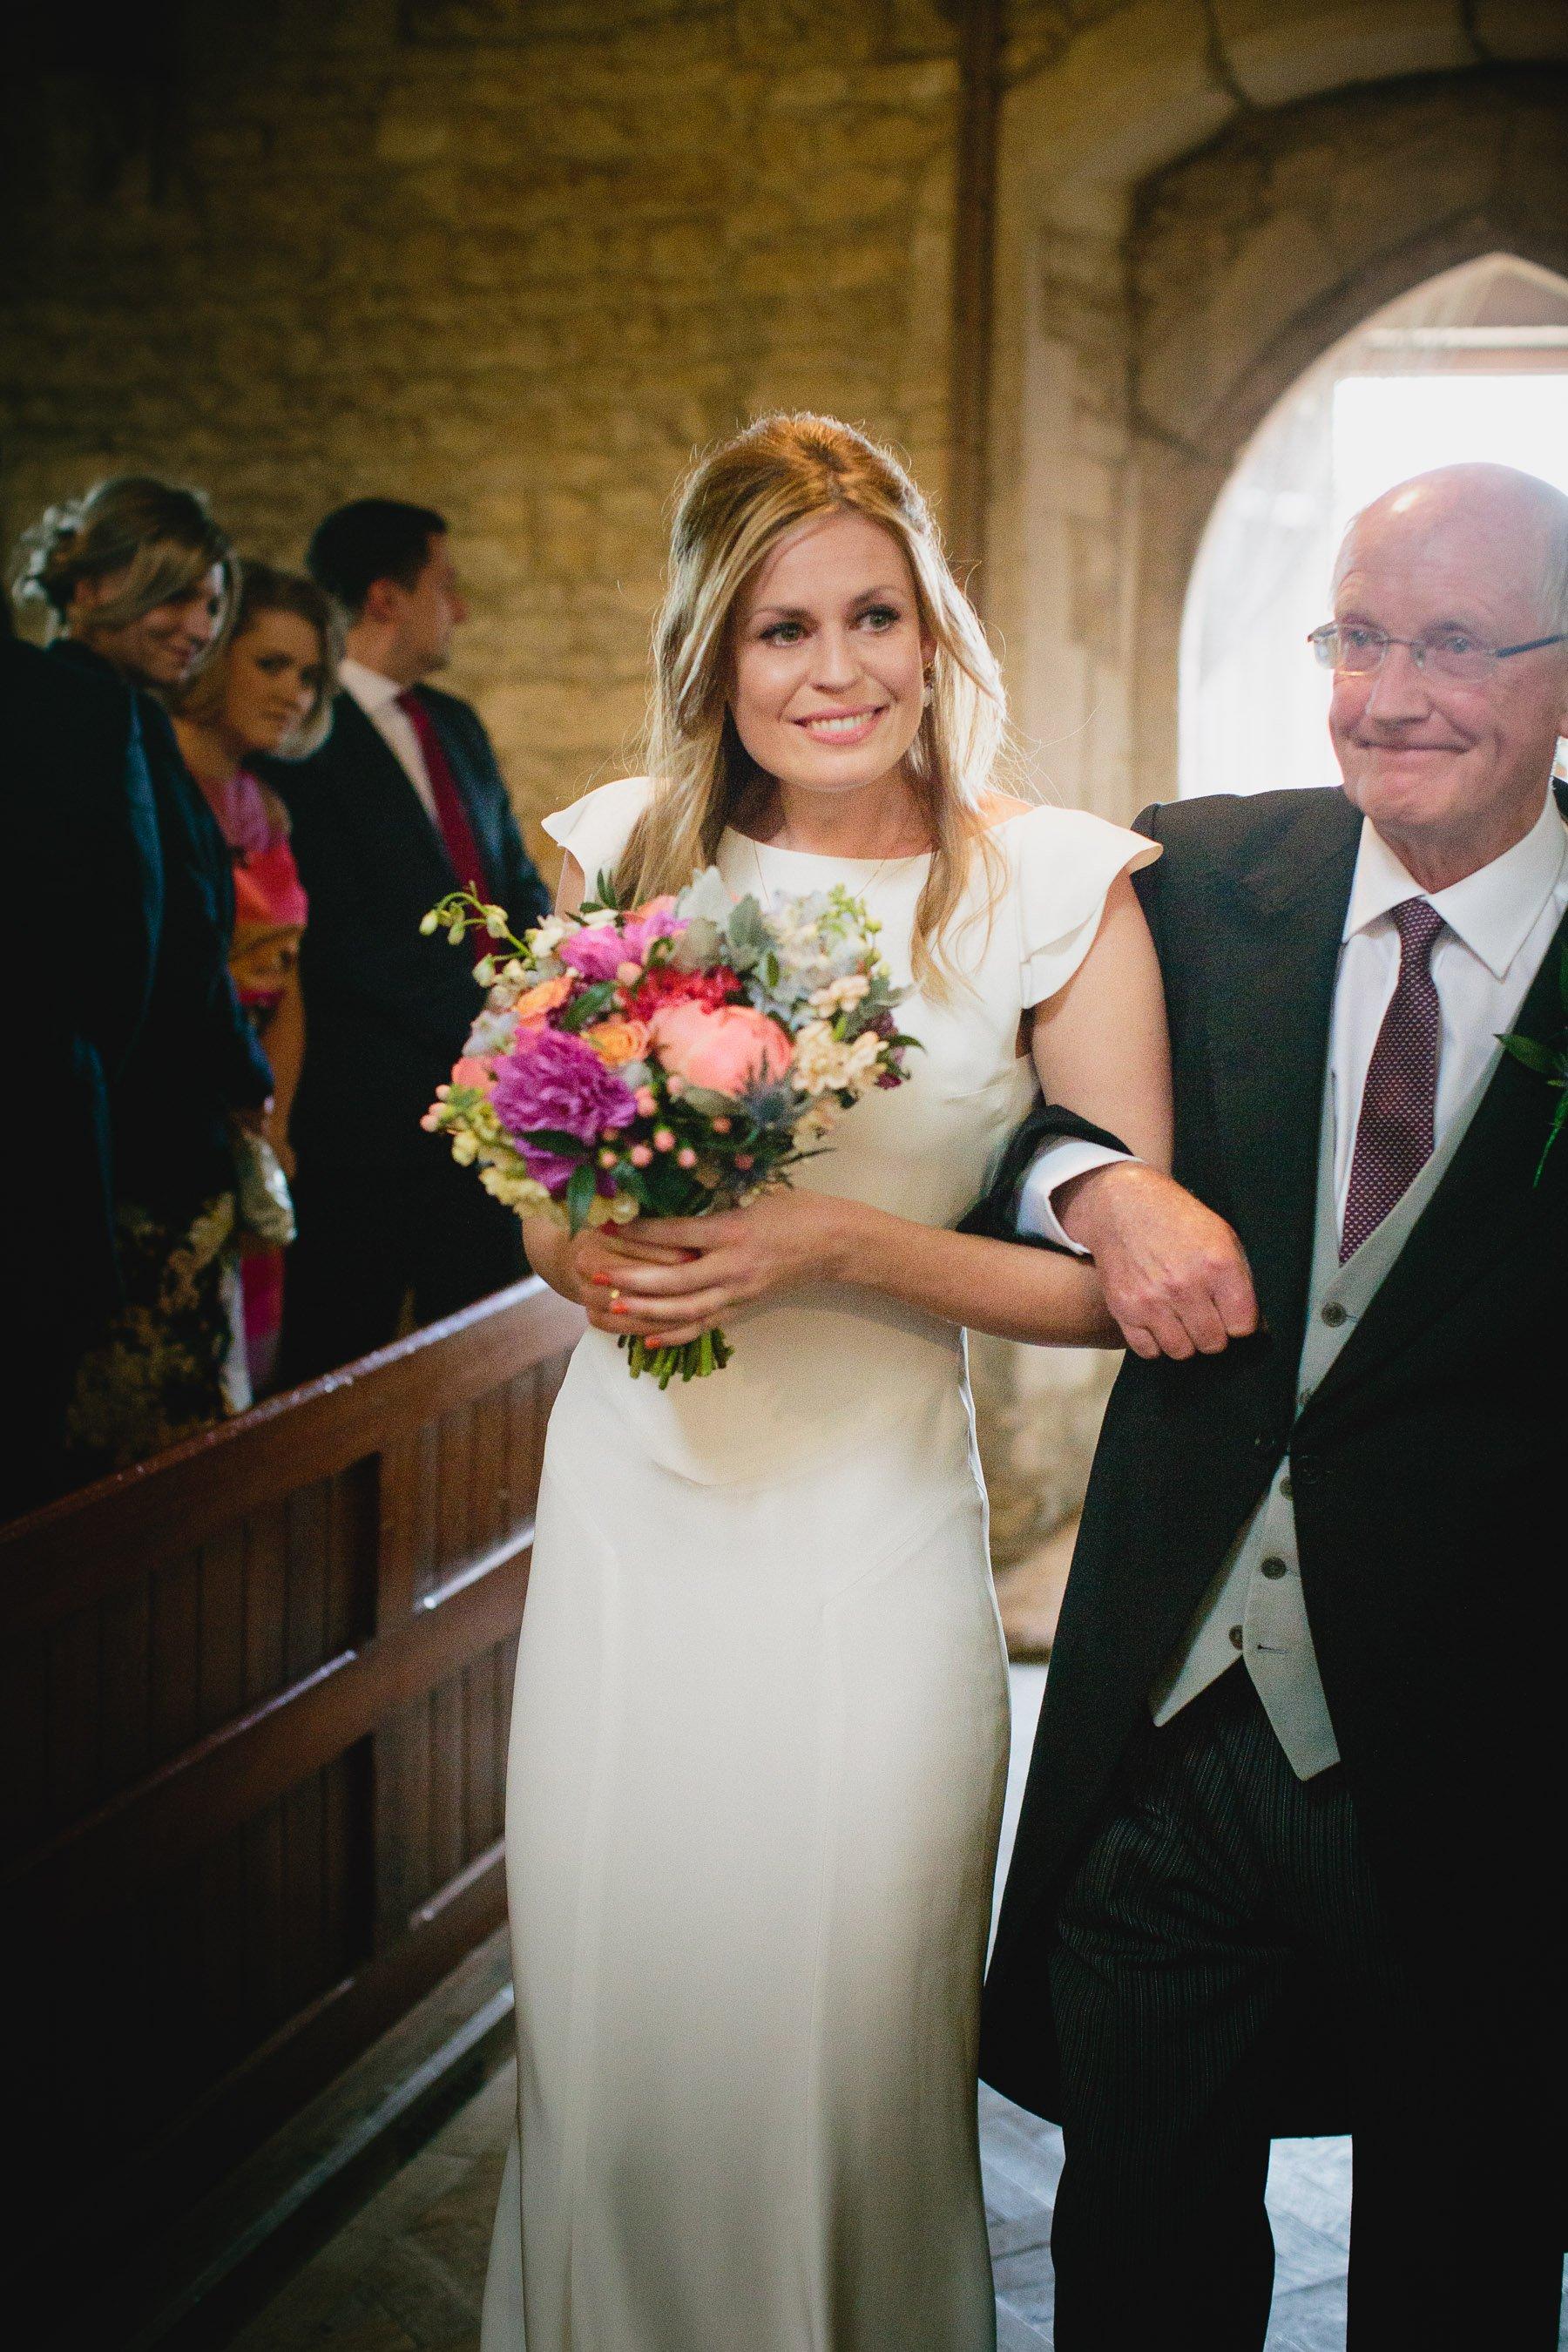 Buckinghamshire-Wedding-Lizzie-Duncan-062